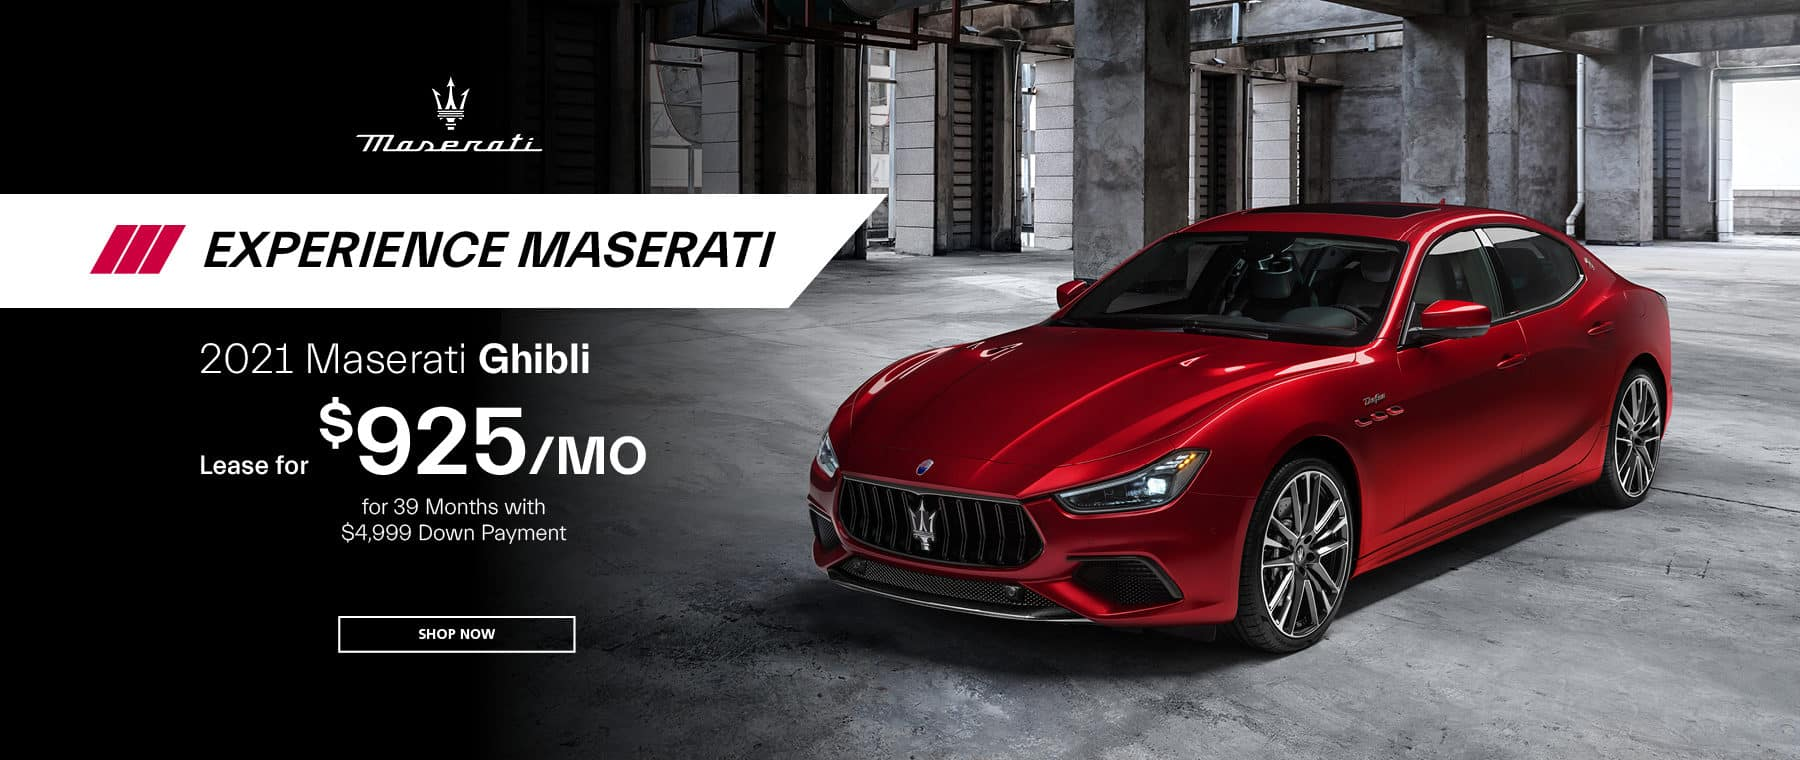 red 2021 Maserati Ghibli